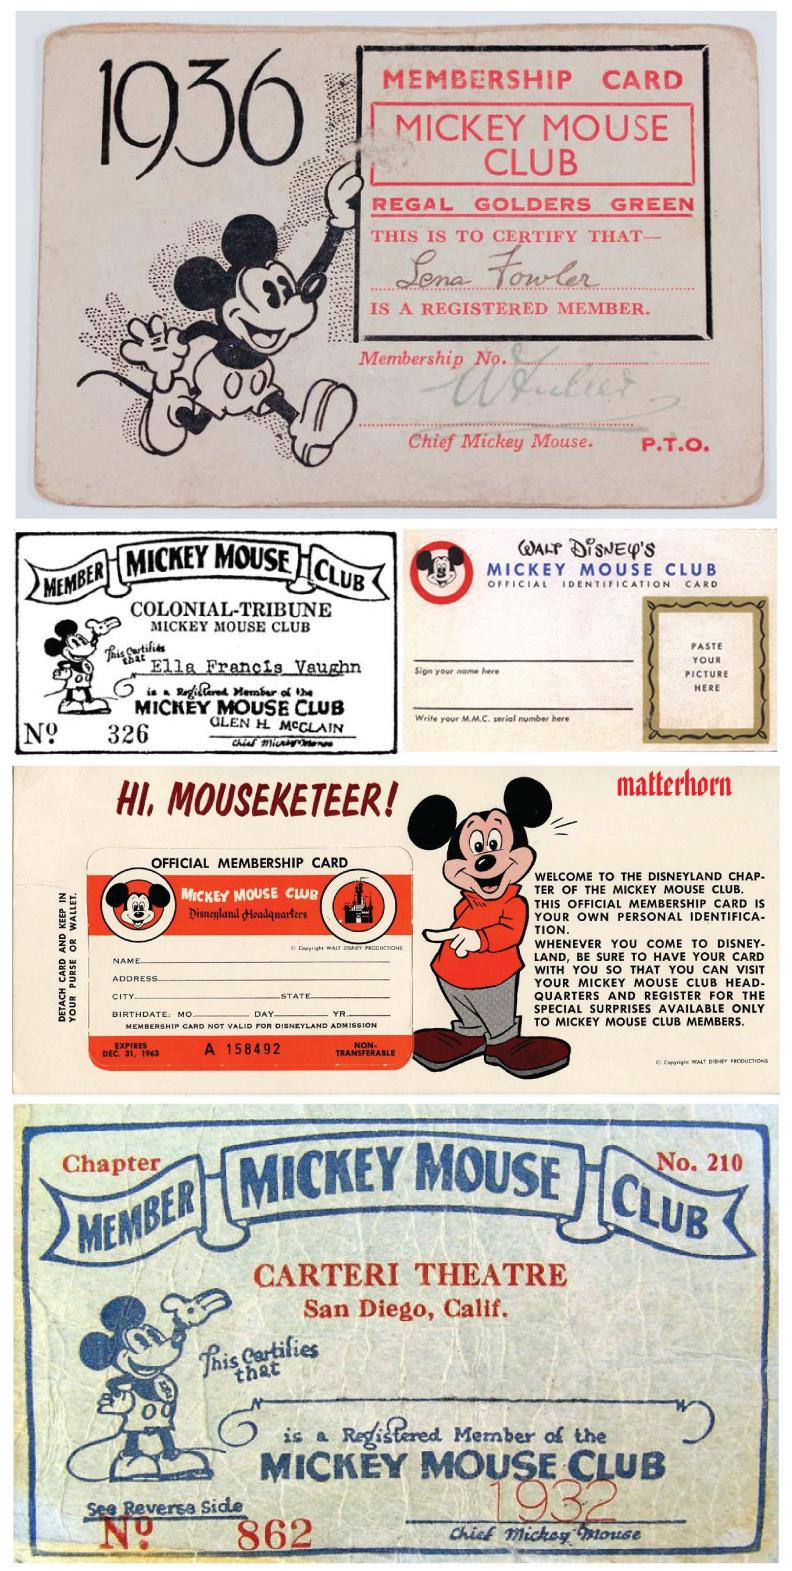 Mickey Mouse Club Member Cards  Membership Card